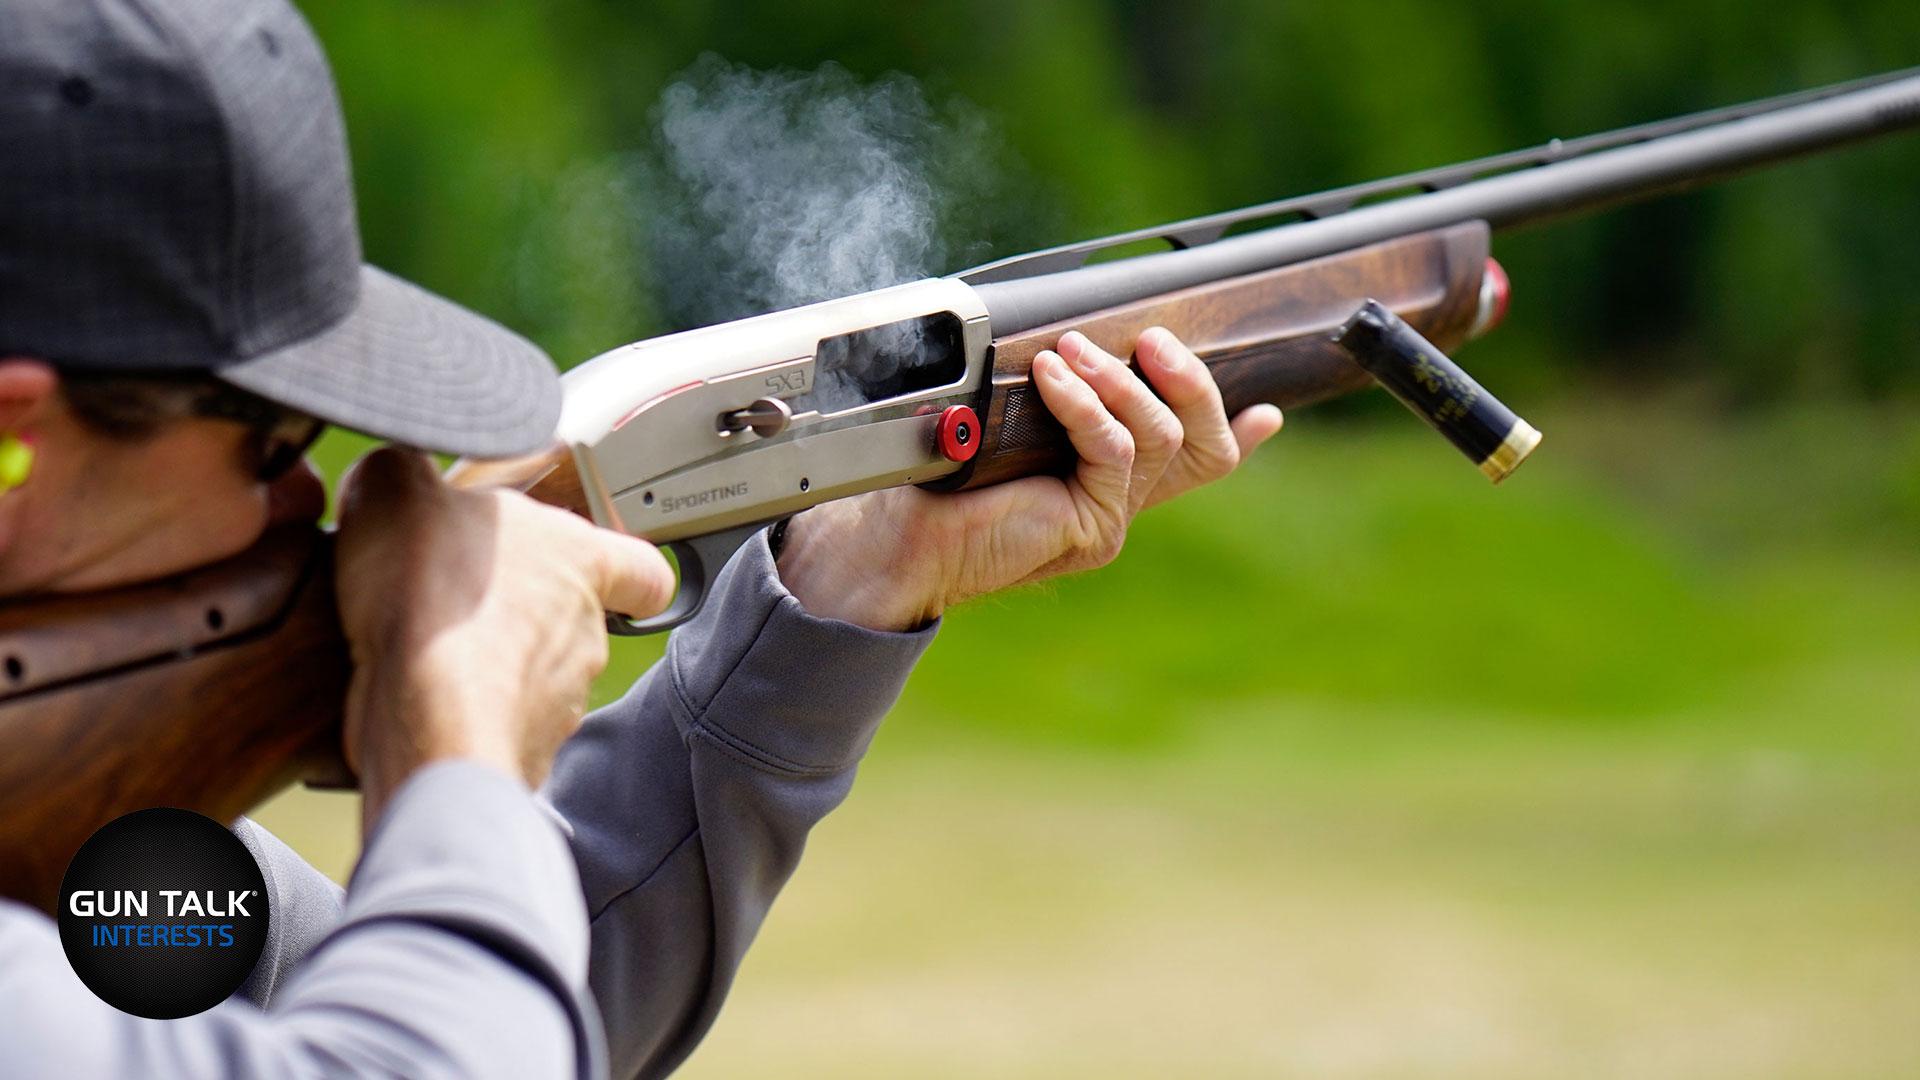 Gun Talk Shows | Gun Talk Interests